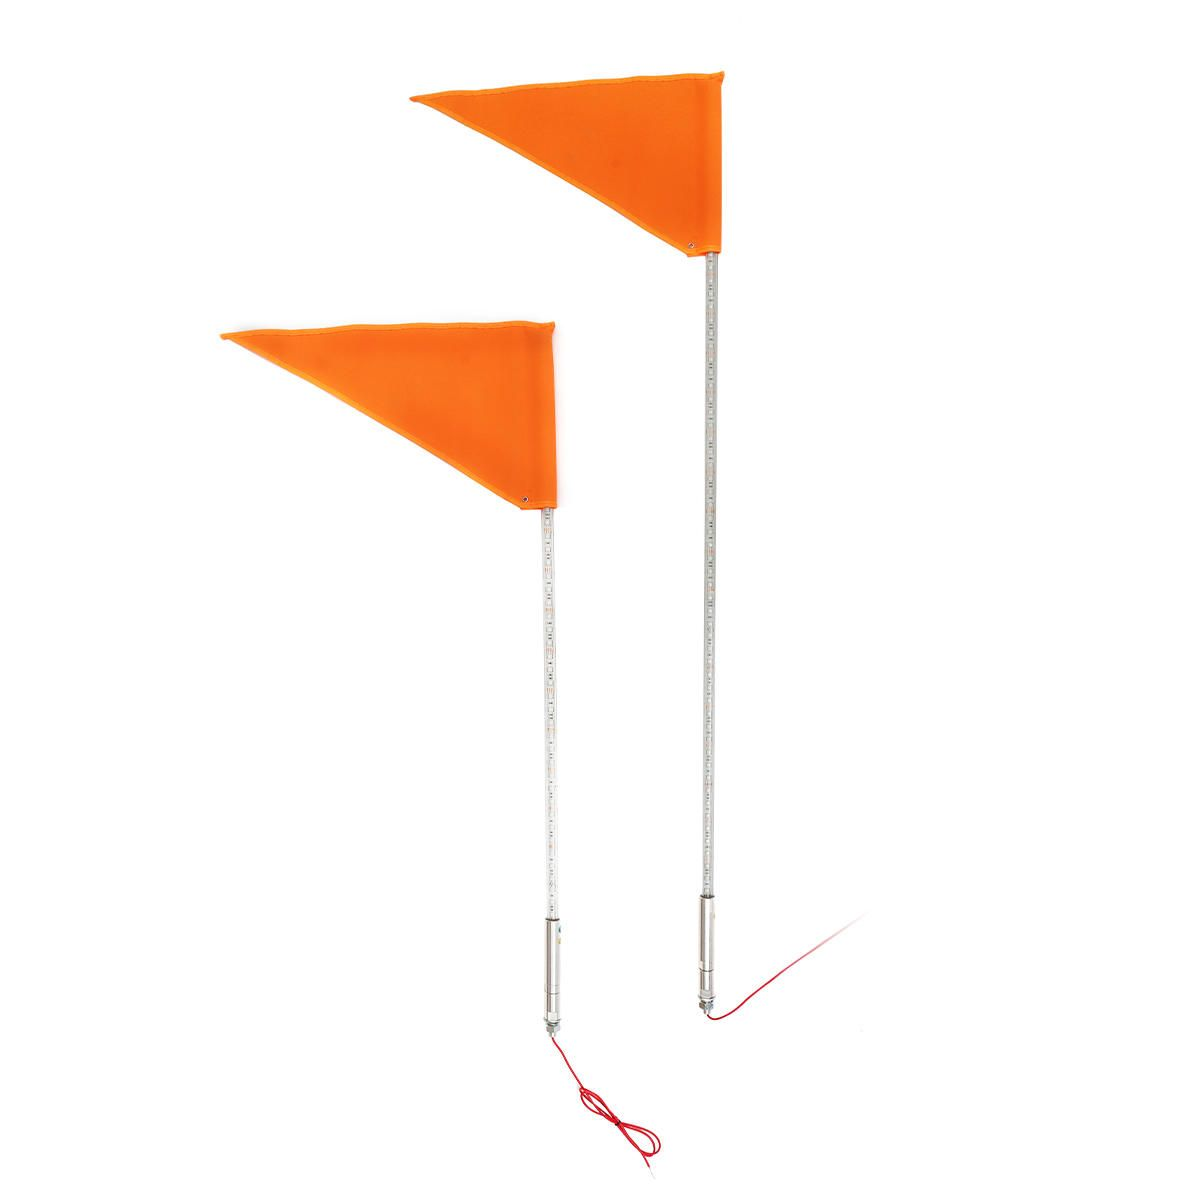 12V 5050 RGB 3ft/4ft Flagpole Lamp 110/160 LED 13 22W/16 30W Lighted Whip Light With Flag For Jeep ATV UTV Motorcycle